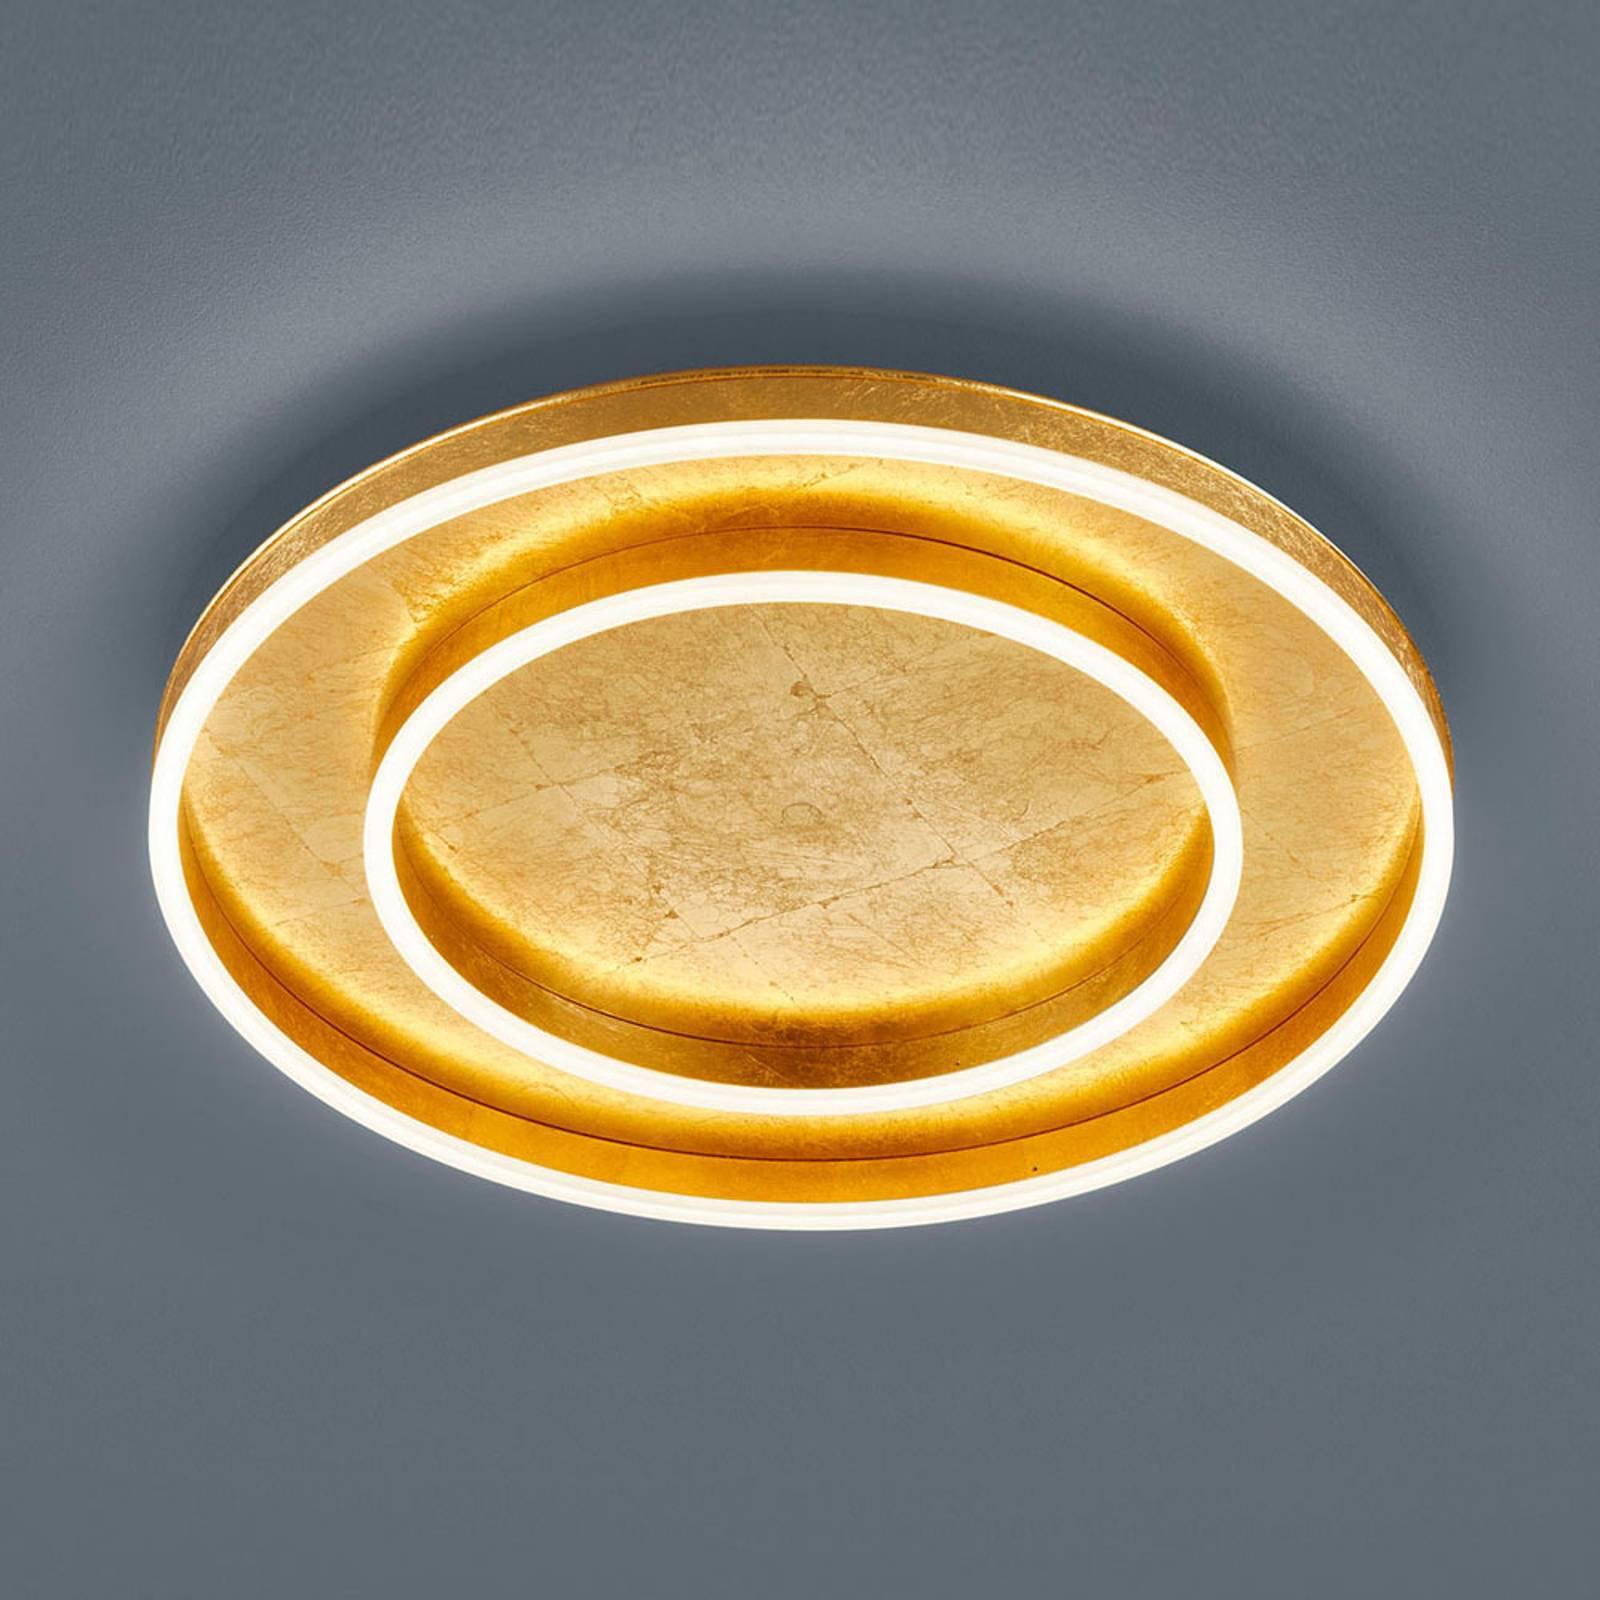 Helestra Sona LED-taklampe dimbar, Ø60cm gull